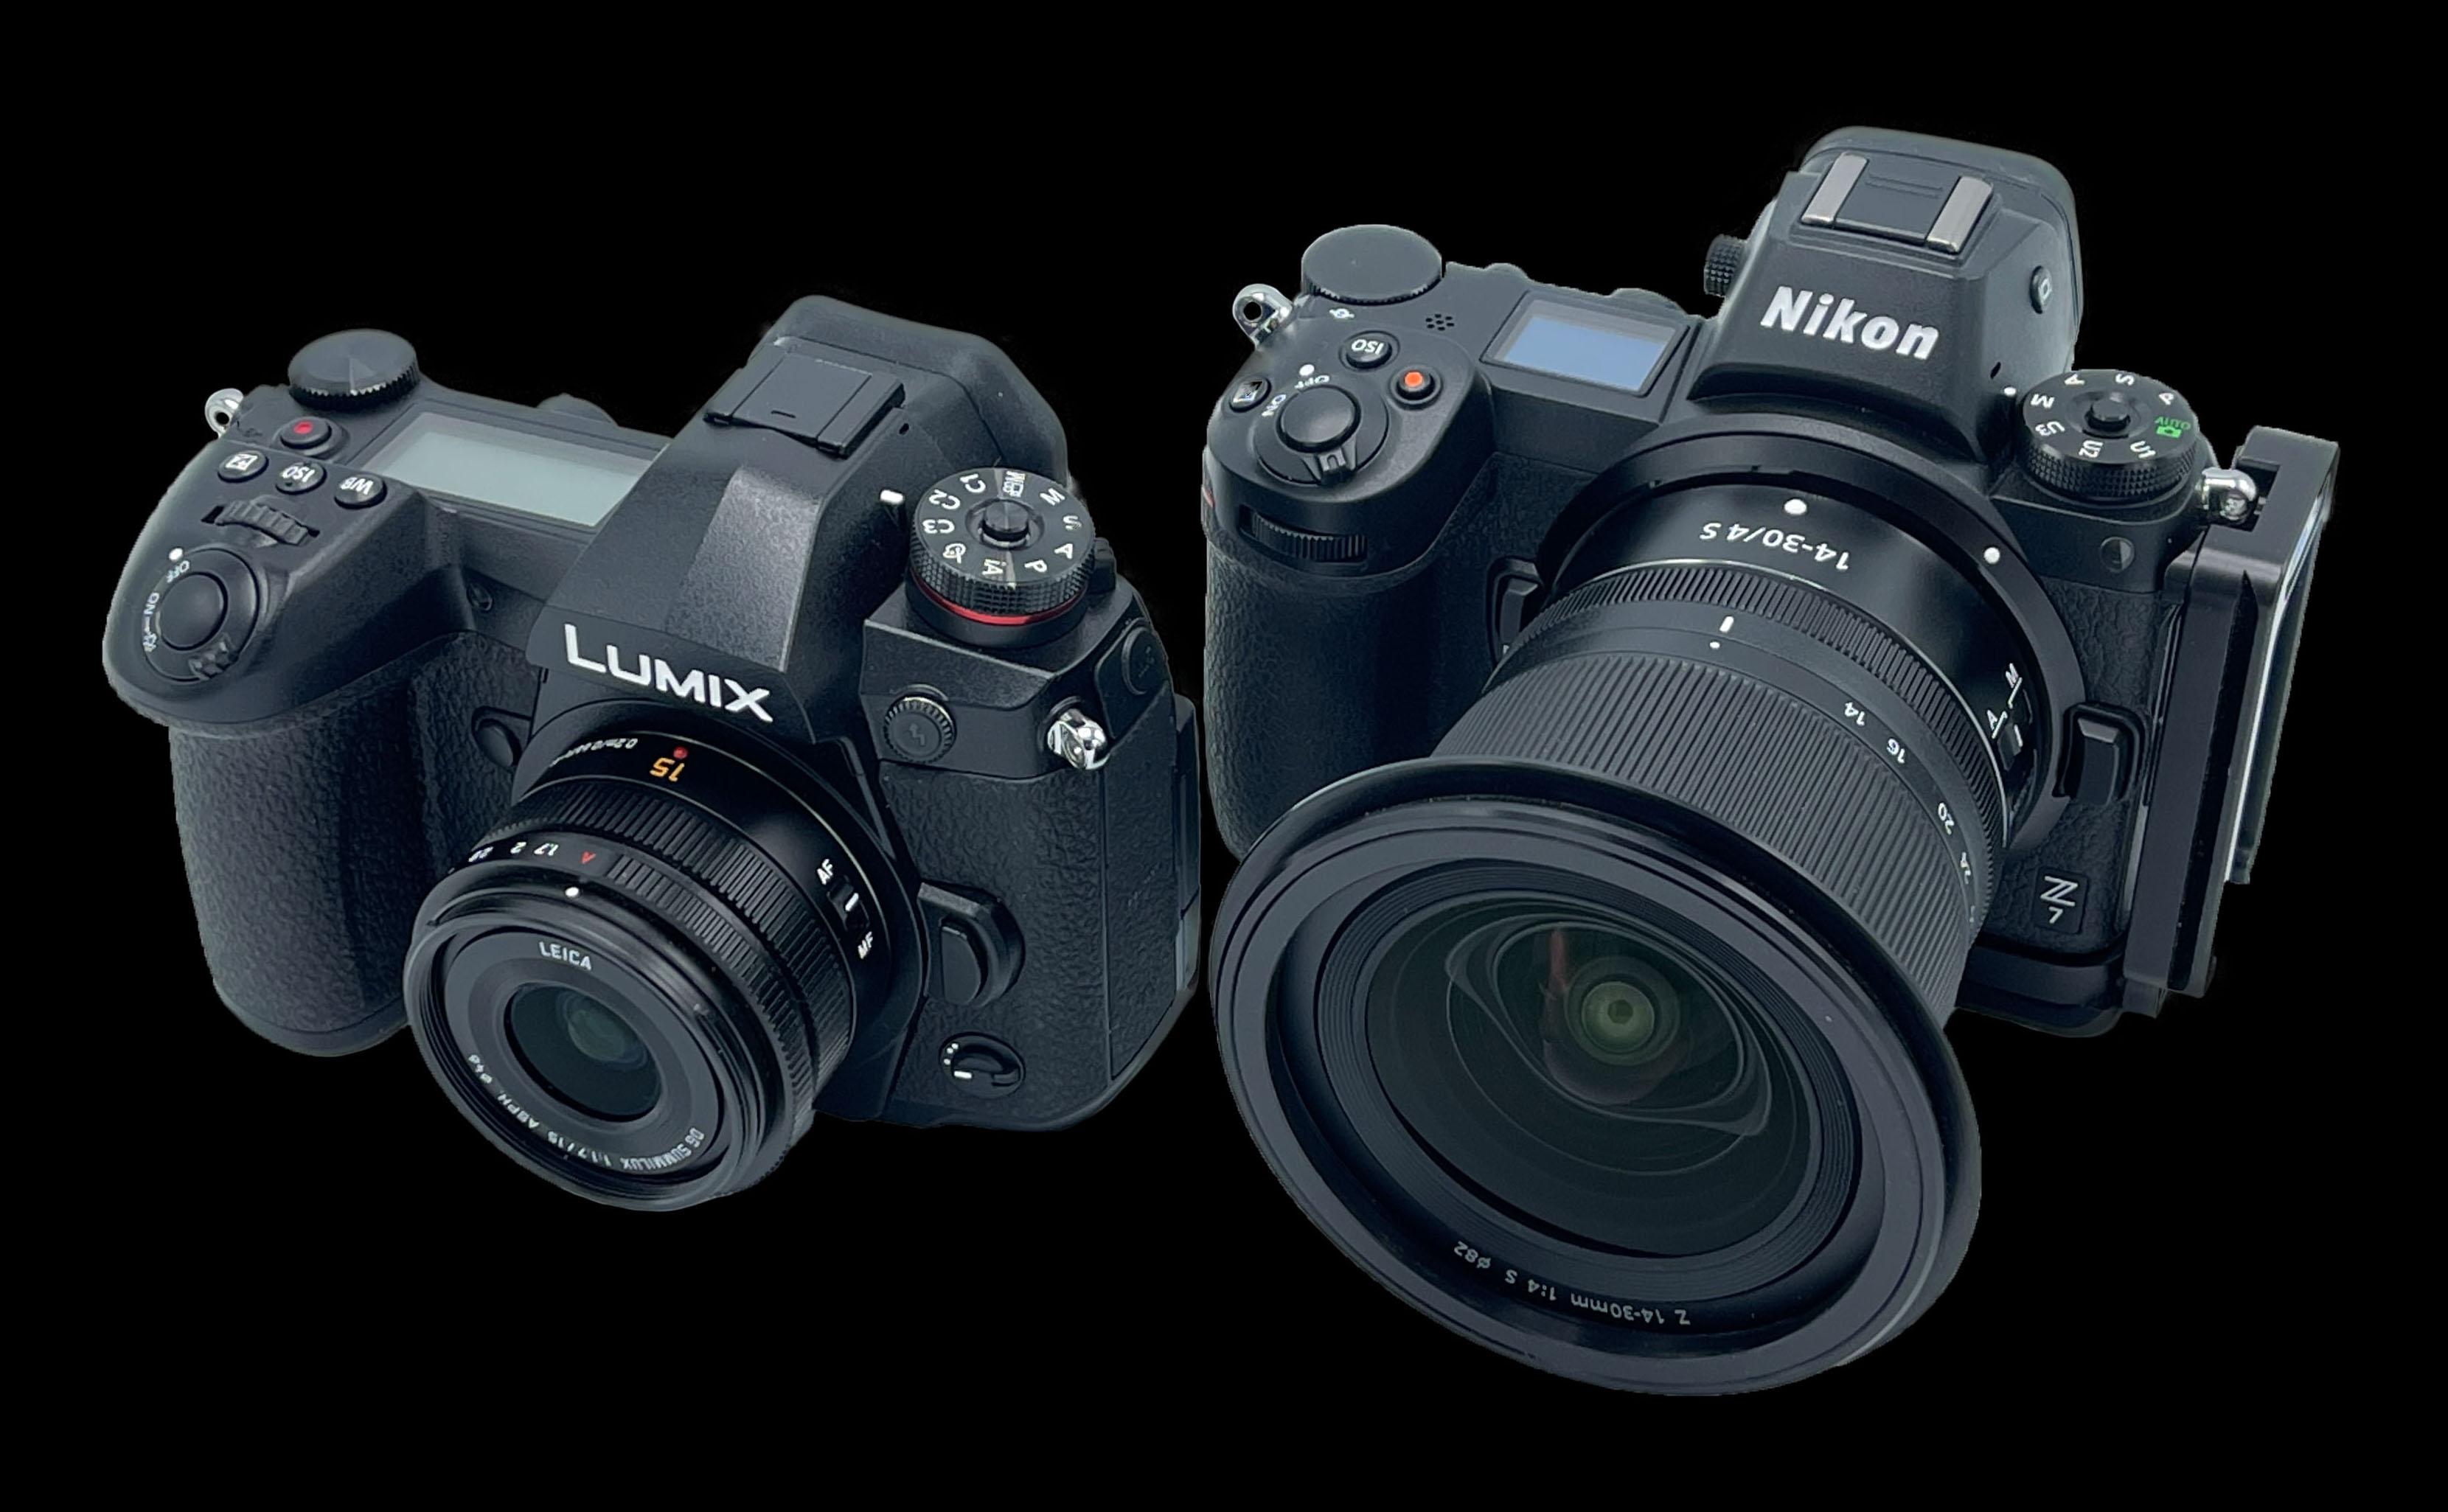 Panasonic Lumix G9 Crop Sensor Camera Vs. Nikon Z7 Full Frame Camera